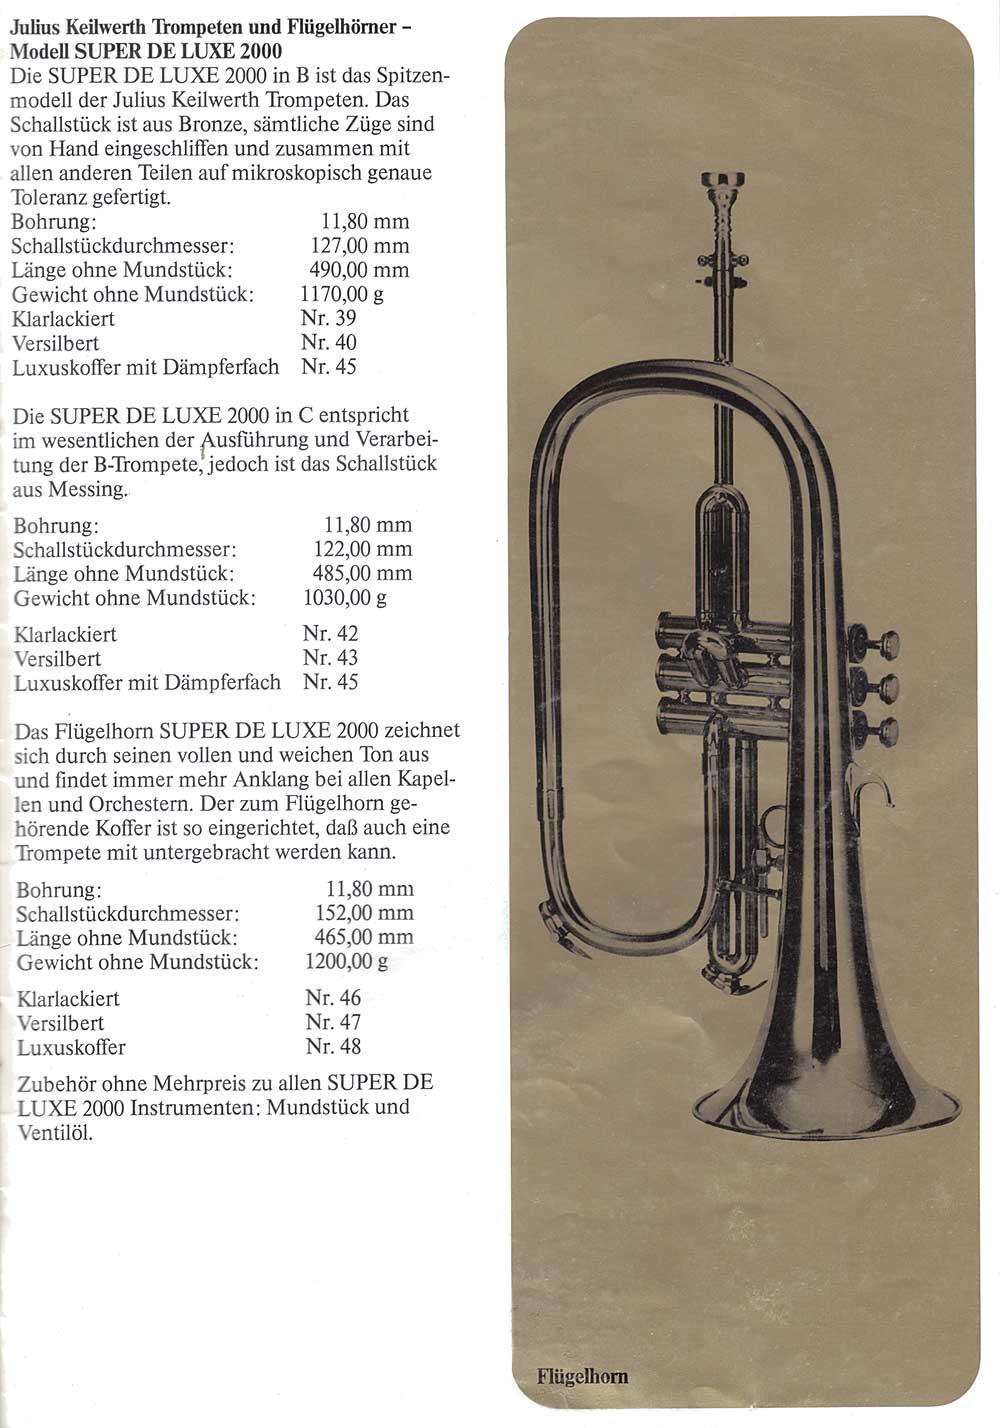 Julius Keilwerth, vintage catalogue, flugelhorn, 1979, page 14, black, gold